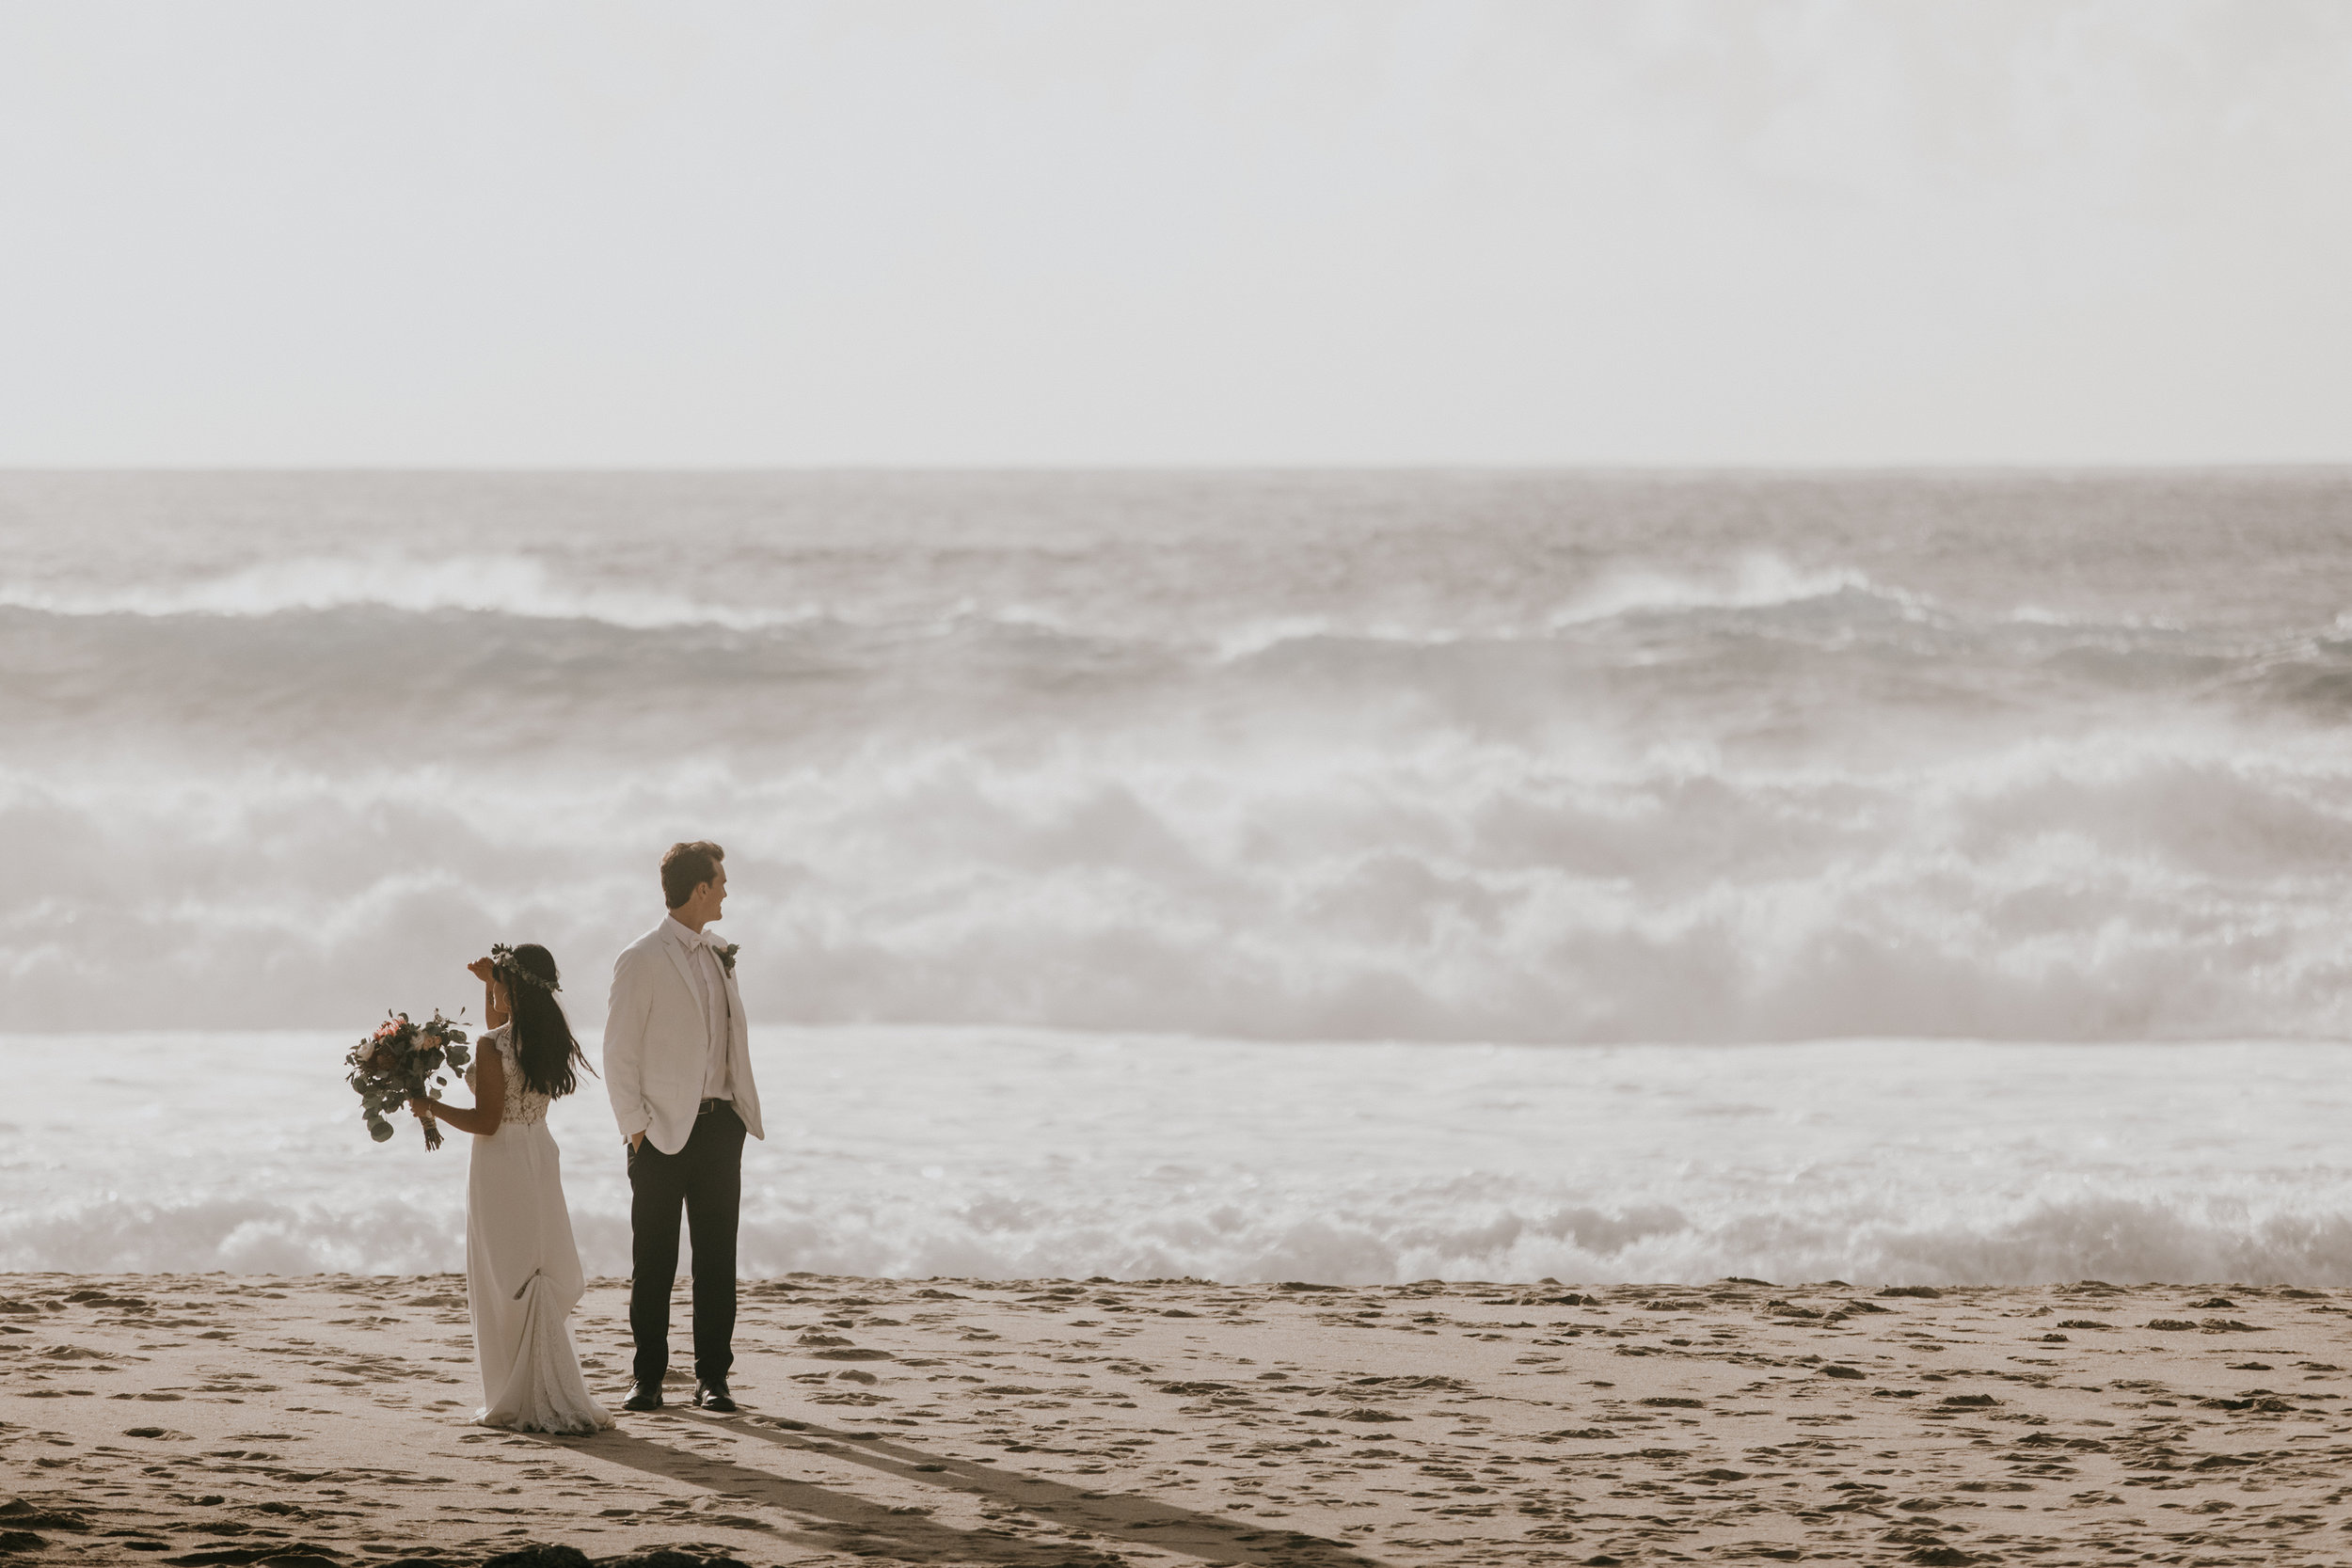 WeddingvenuesinBigsur.jpg